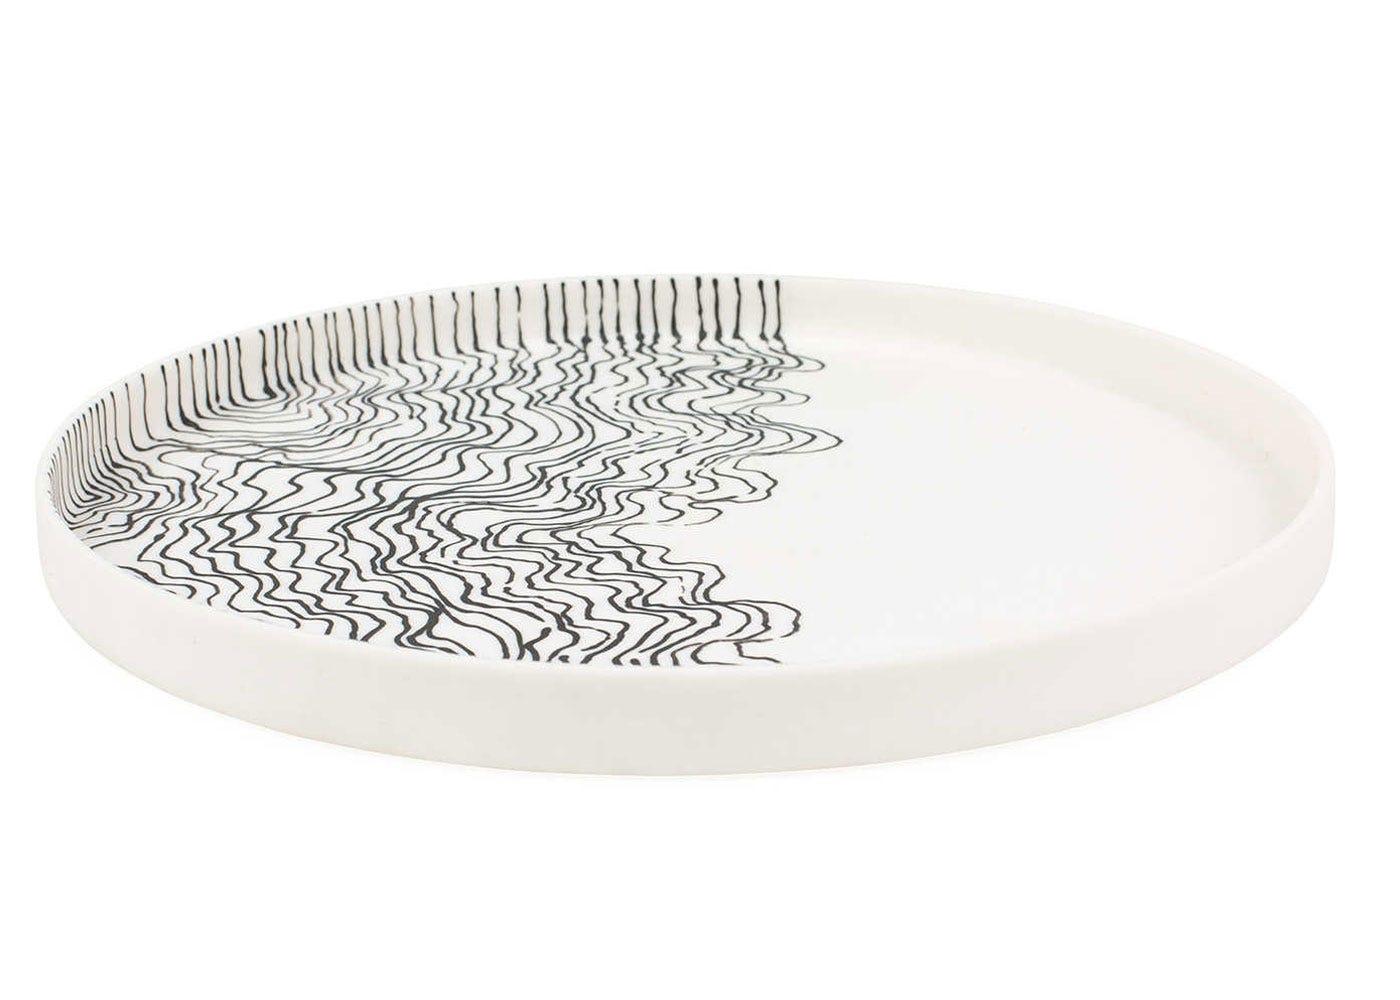 Estuarine plate white medium side view